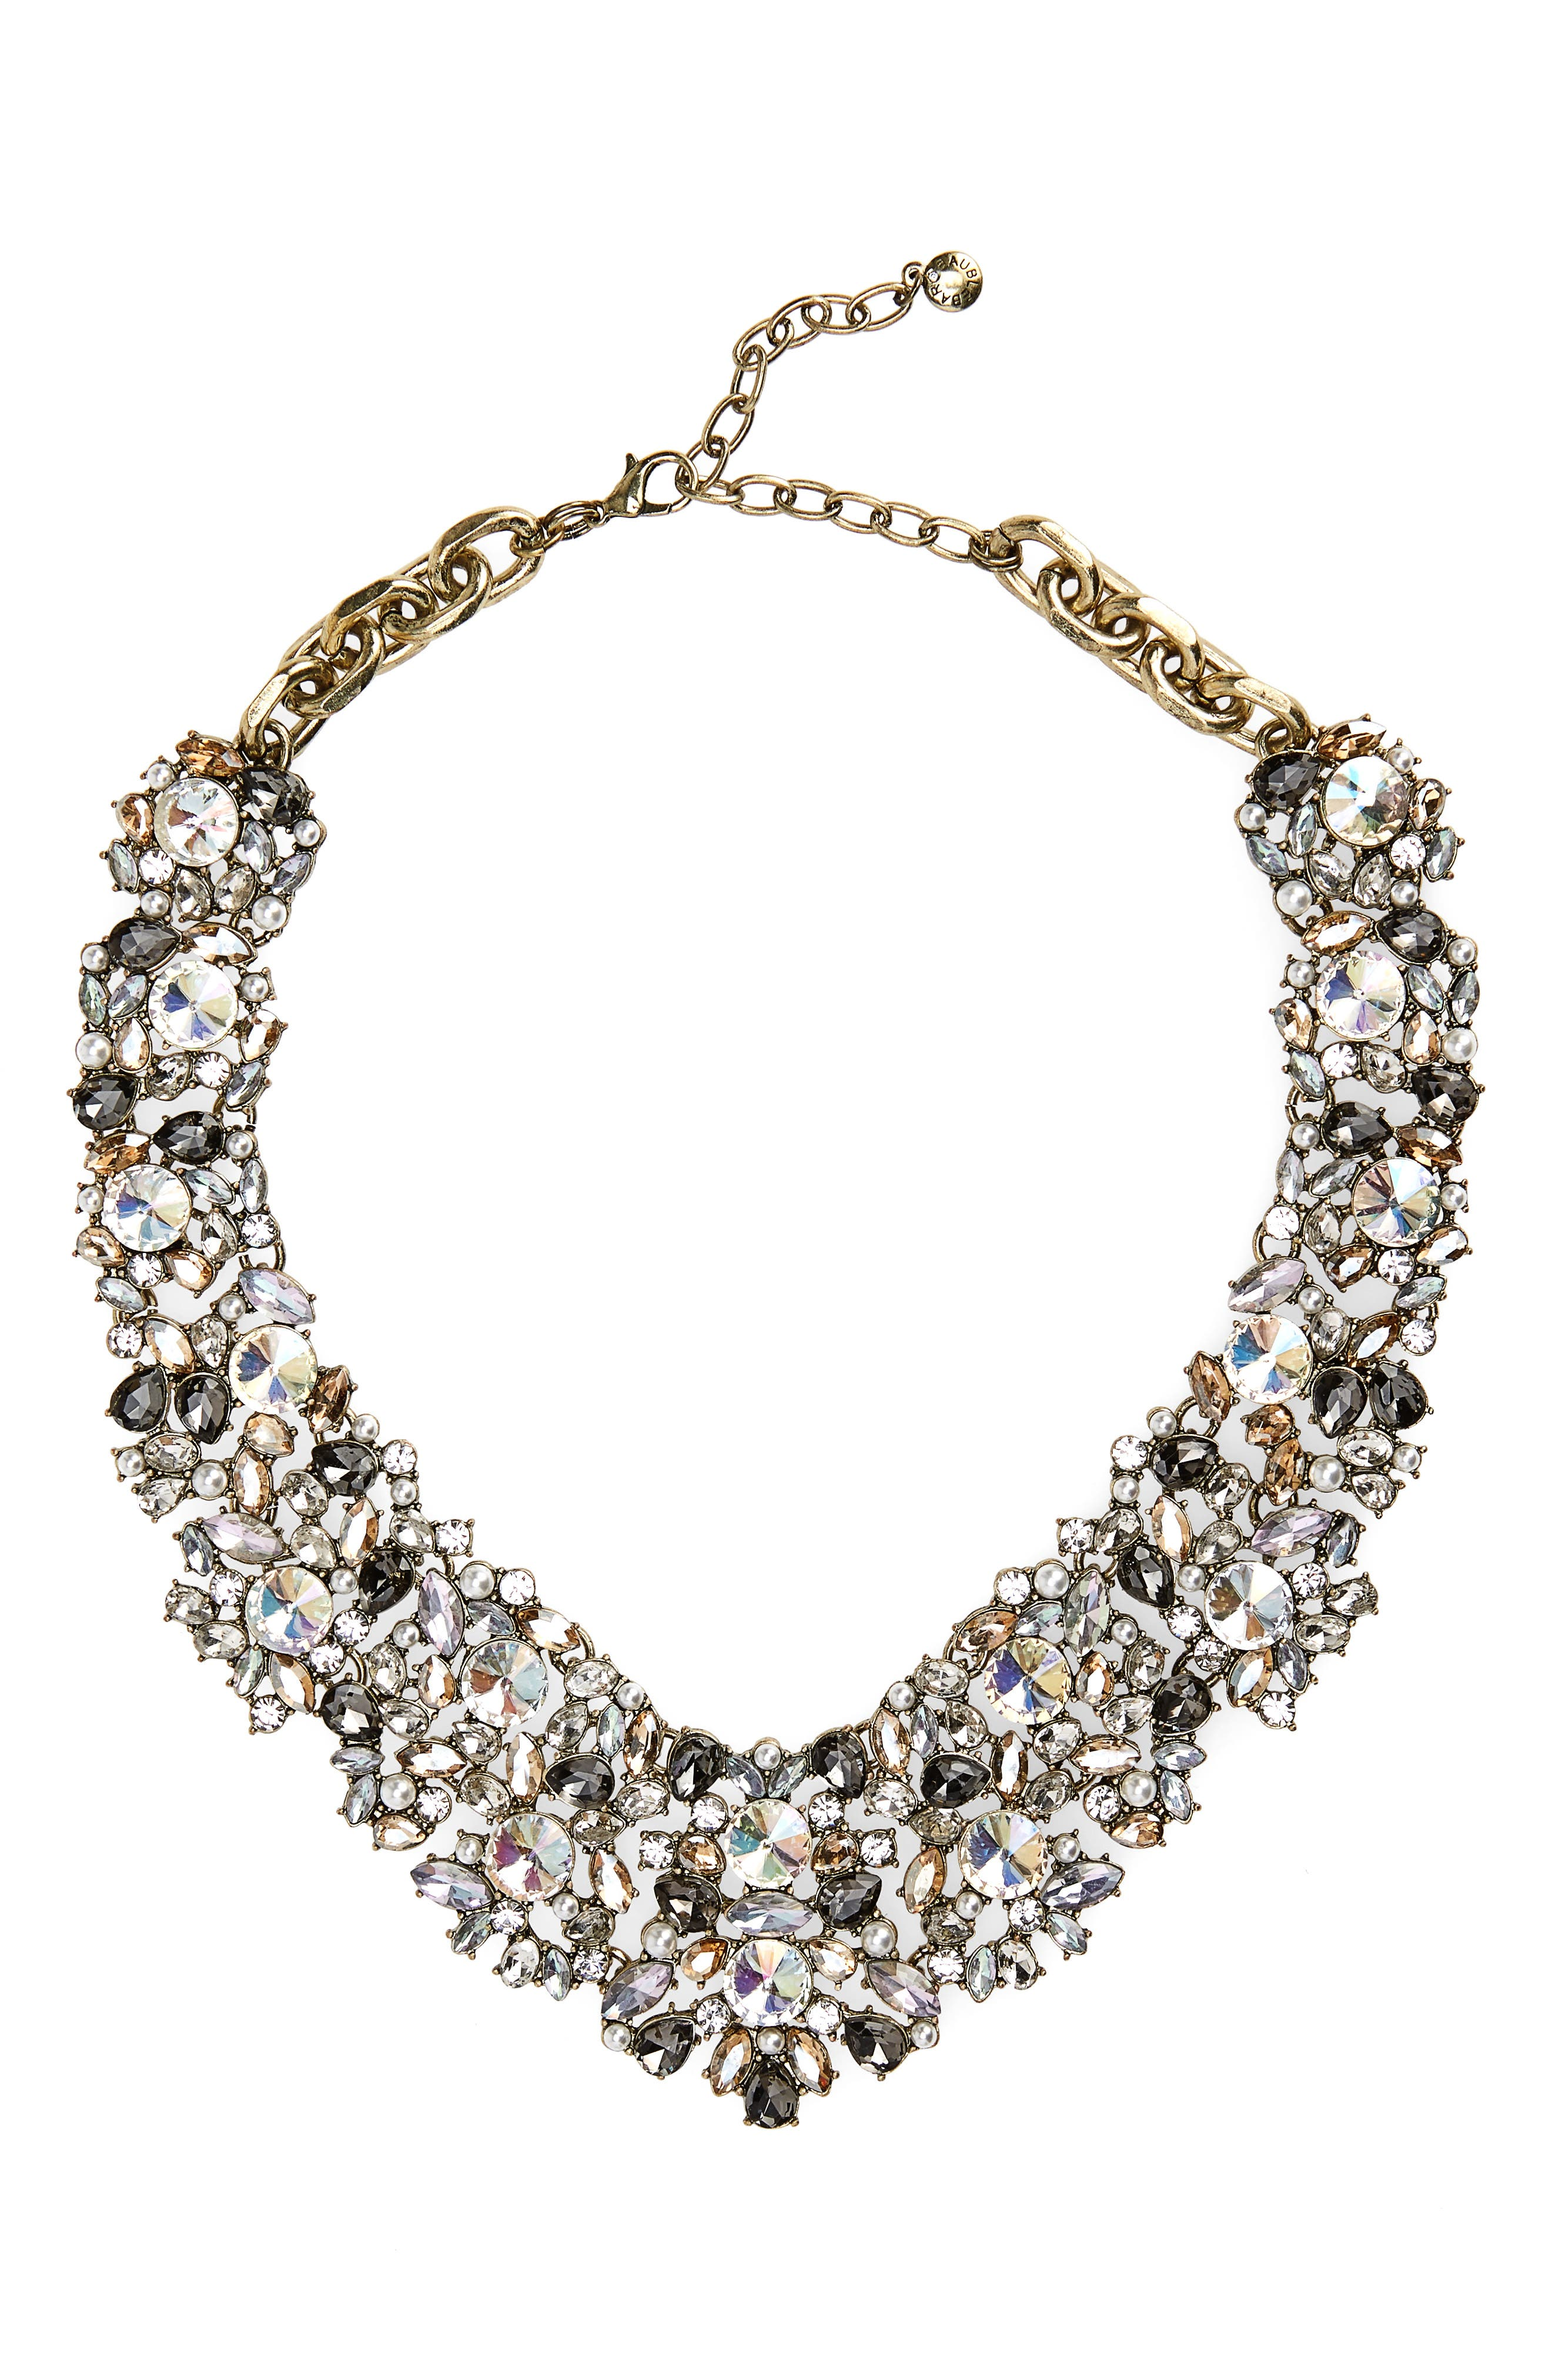 BAUBLEBAR, Crystal Collar Necklace, Main thumbnail 1, color, 020